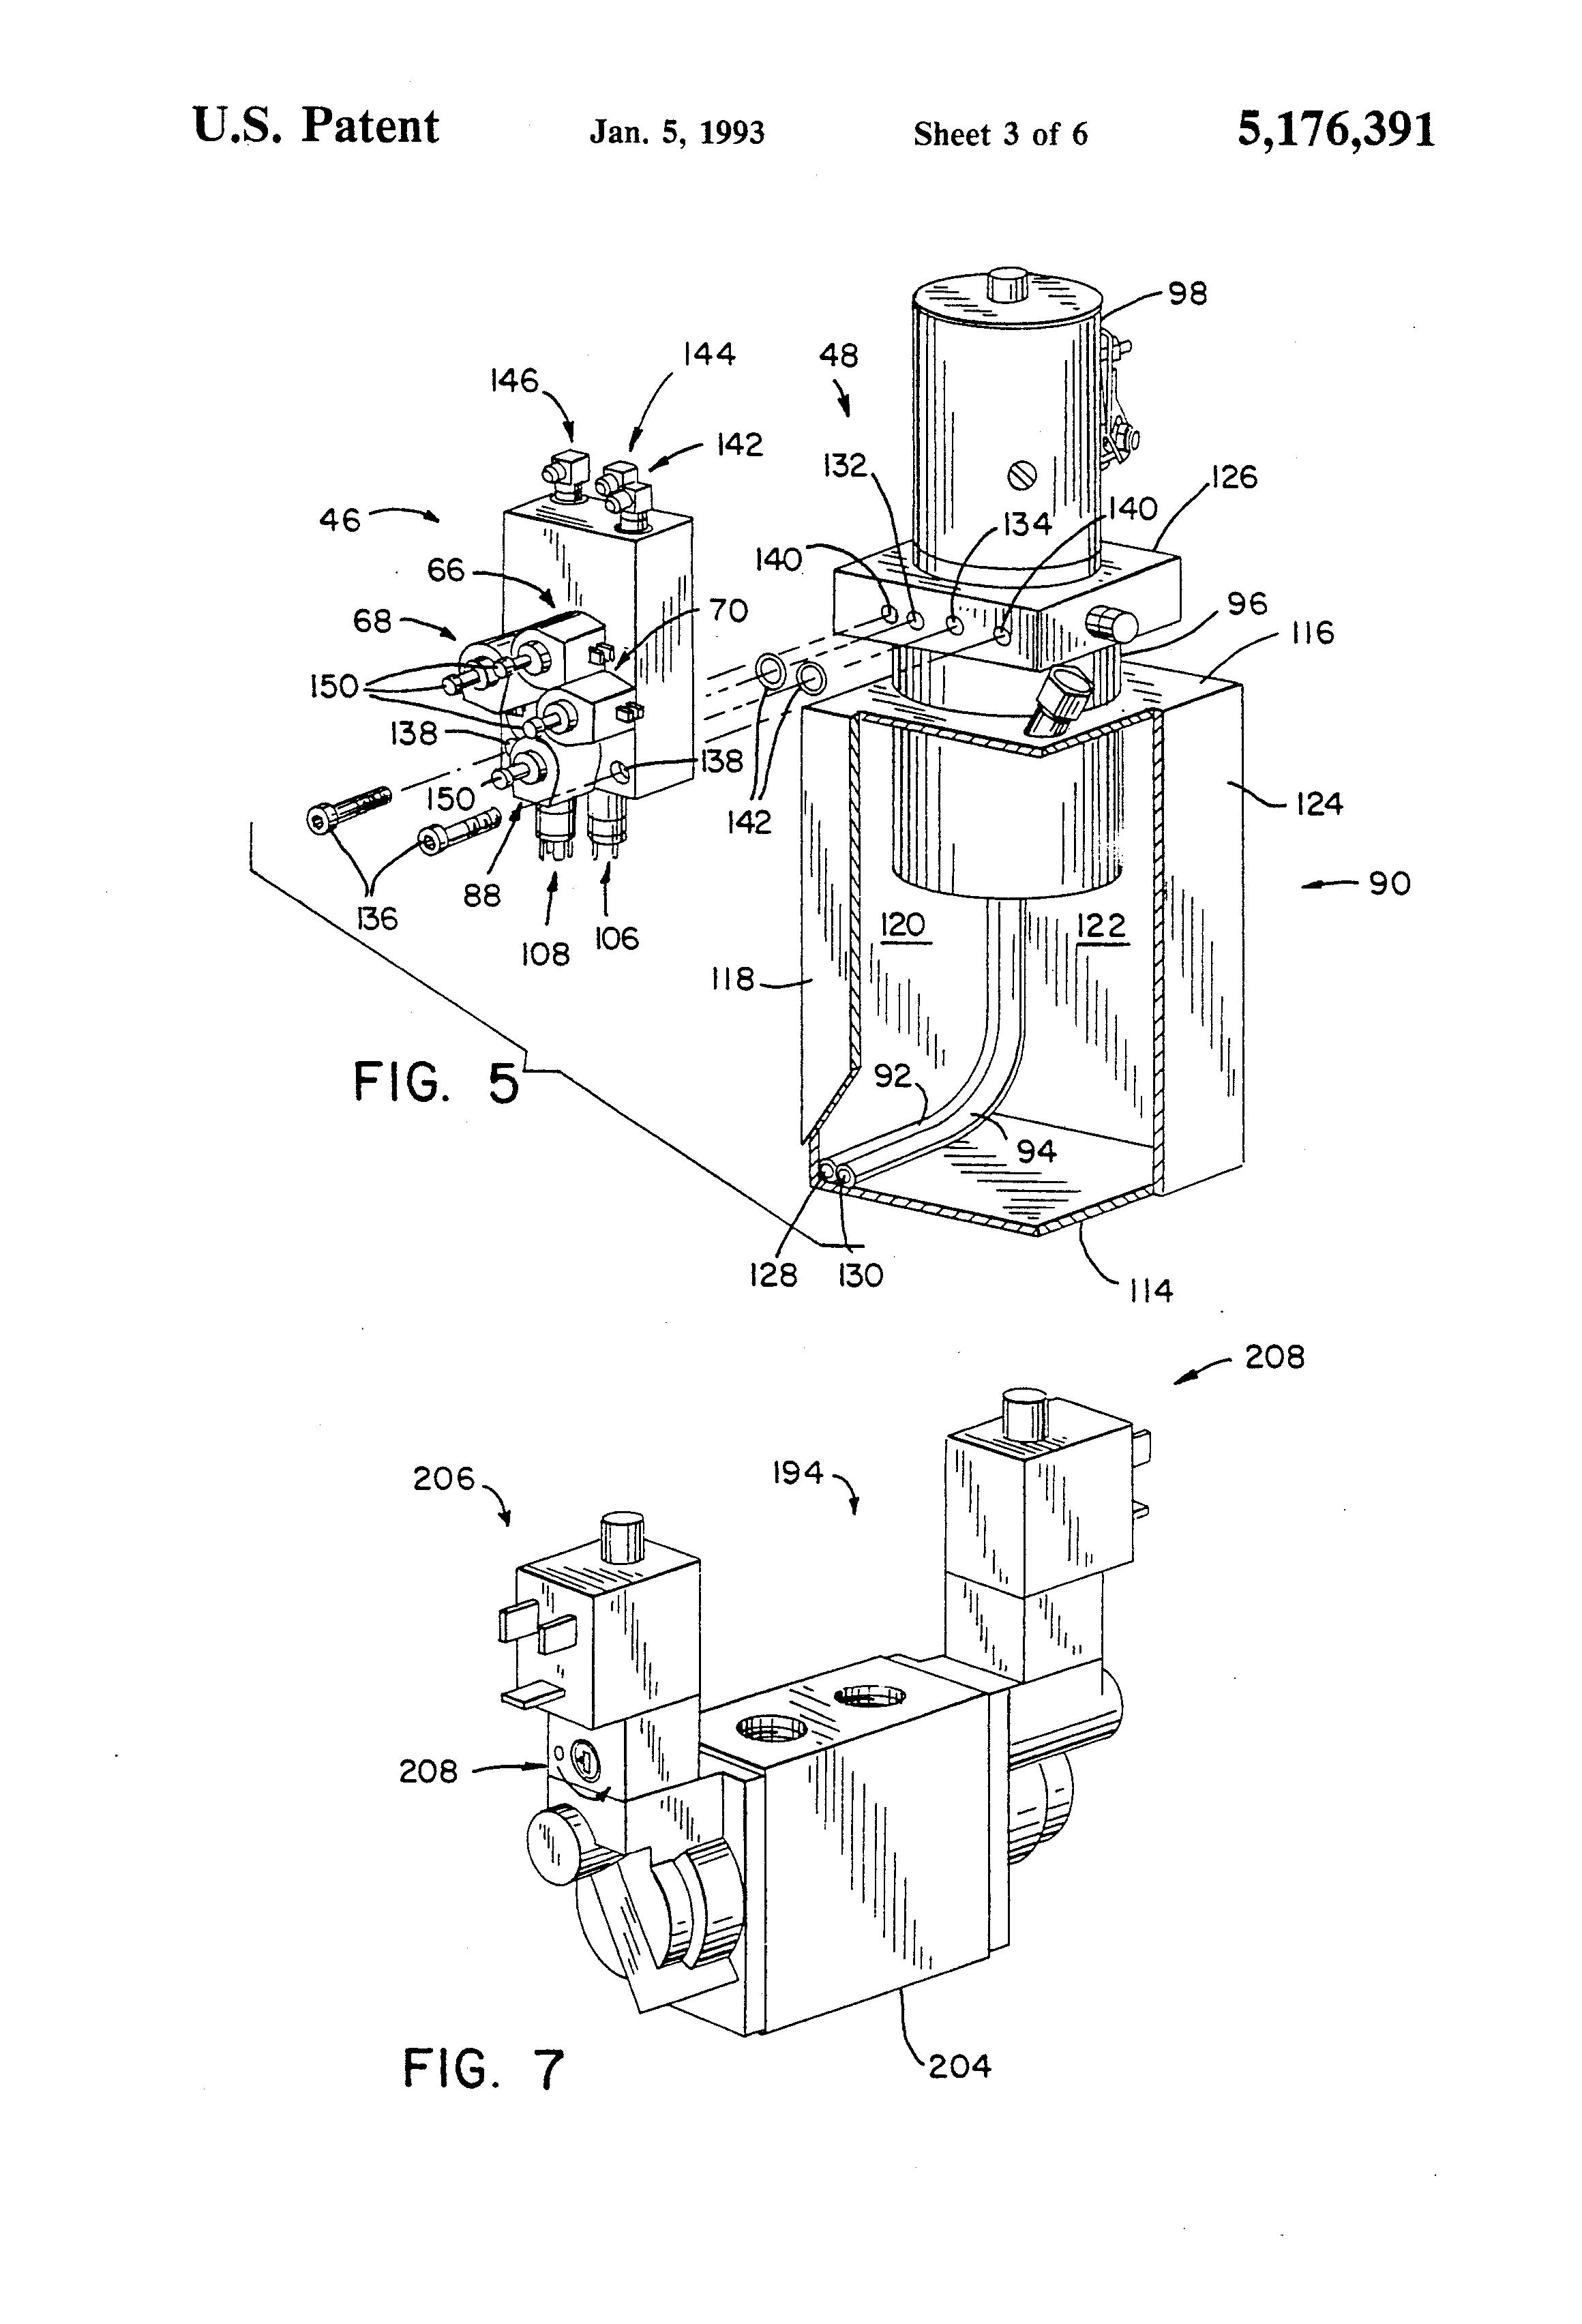 lippert hydraulic 19832 wiring diagram manual e books Power Wiring Diagram wrg 6760] lippert hydraulic 19832 wiring diagramhydraulic pump wiring diagram hydraulic pump wiring patent us5176391